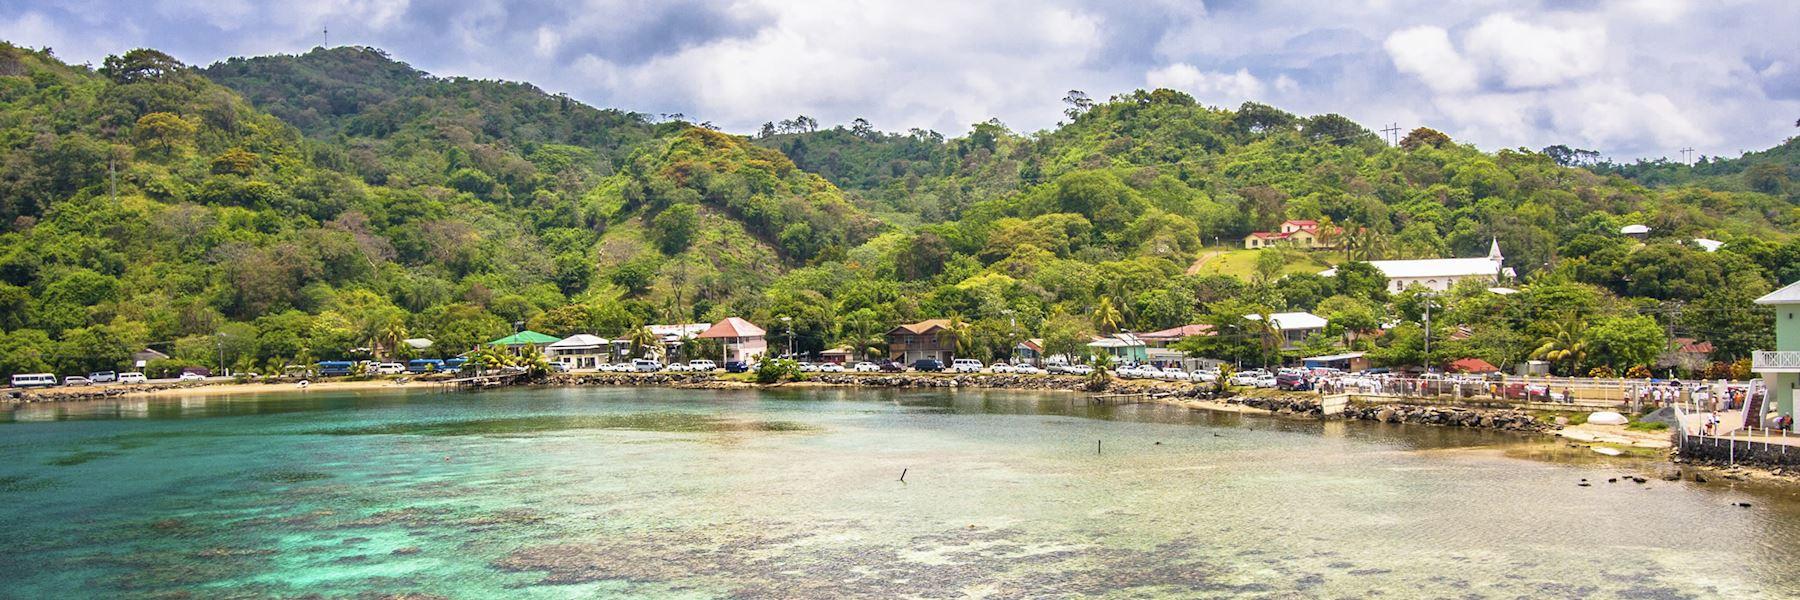 Visit Roatán Island, Honduras